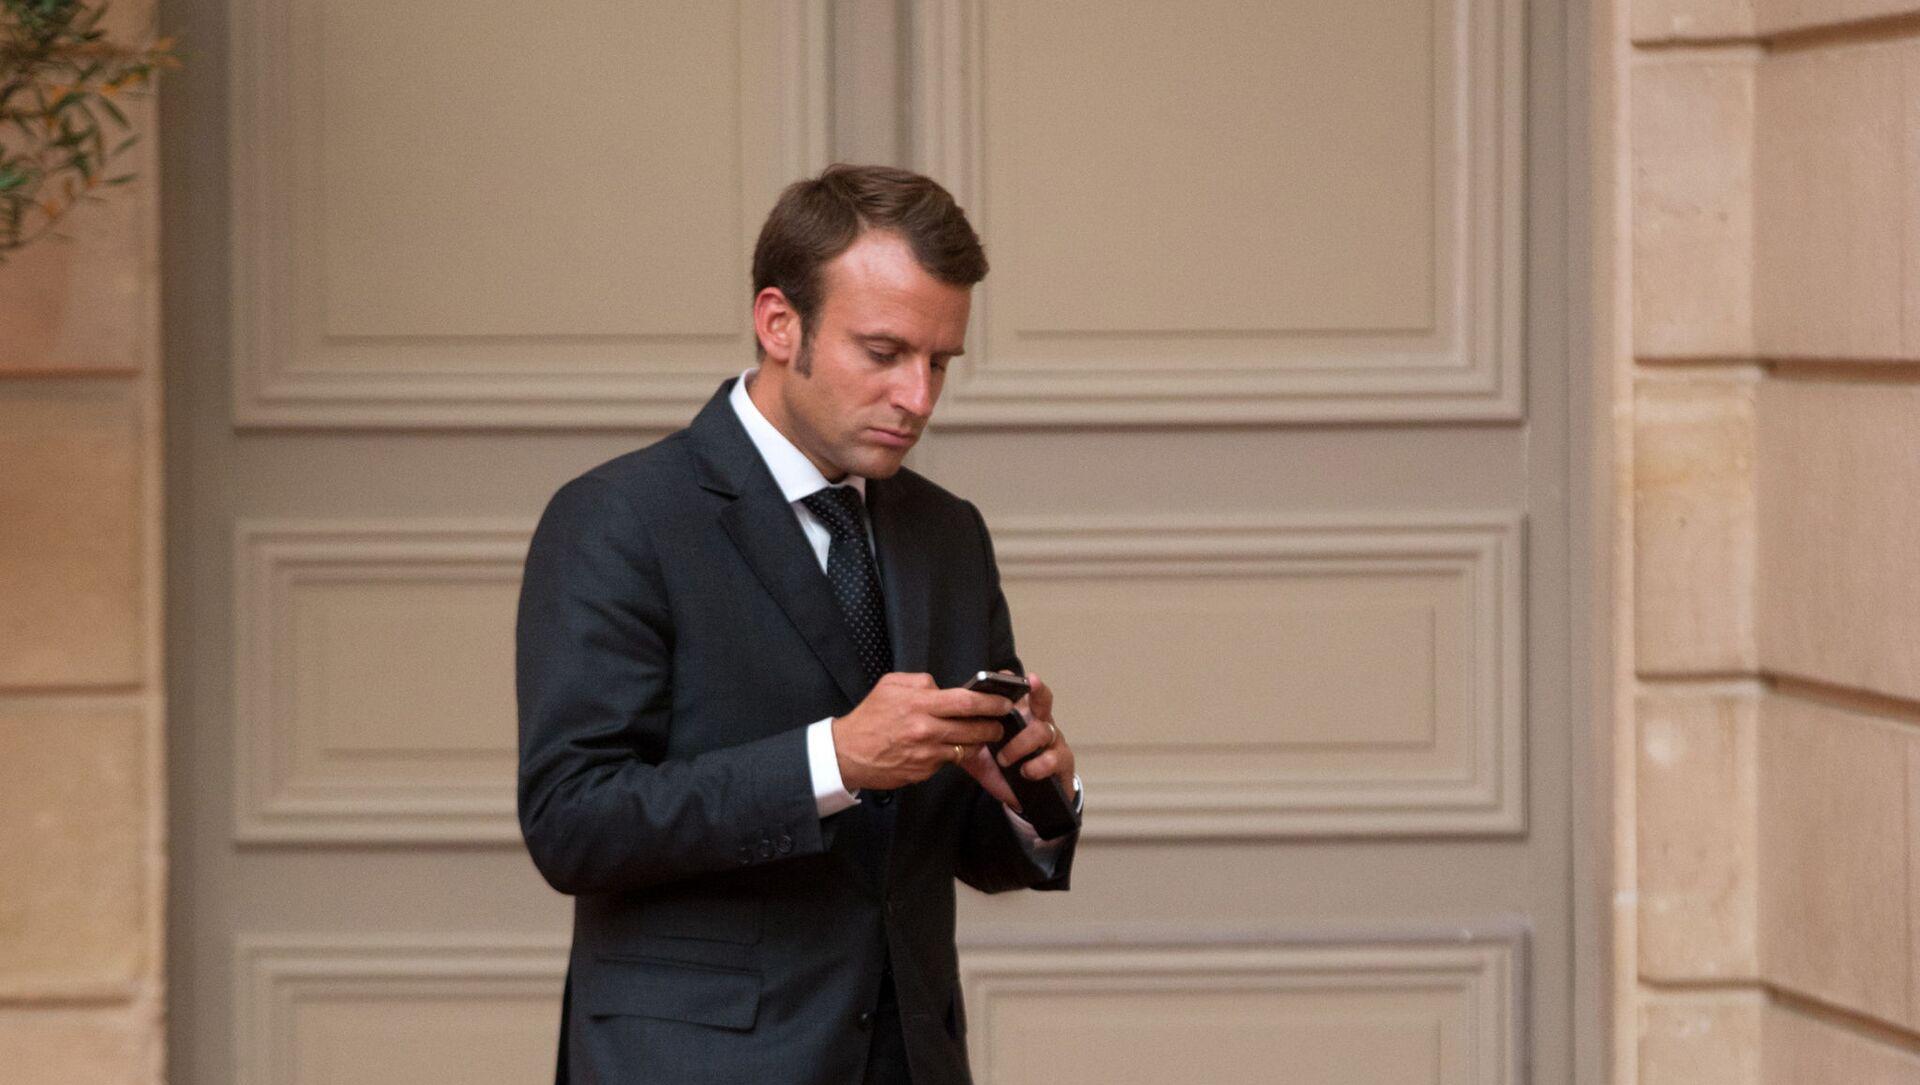 Emmanuel Macron, looks at his phone - Sputnik International, 1920, 25.07.2021